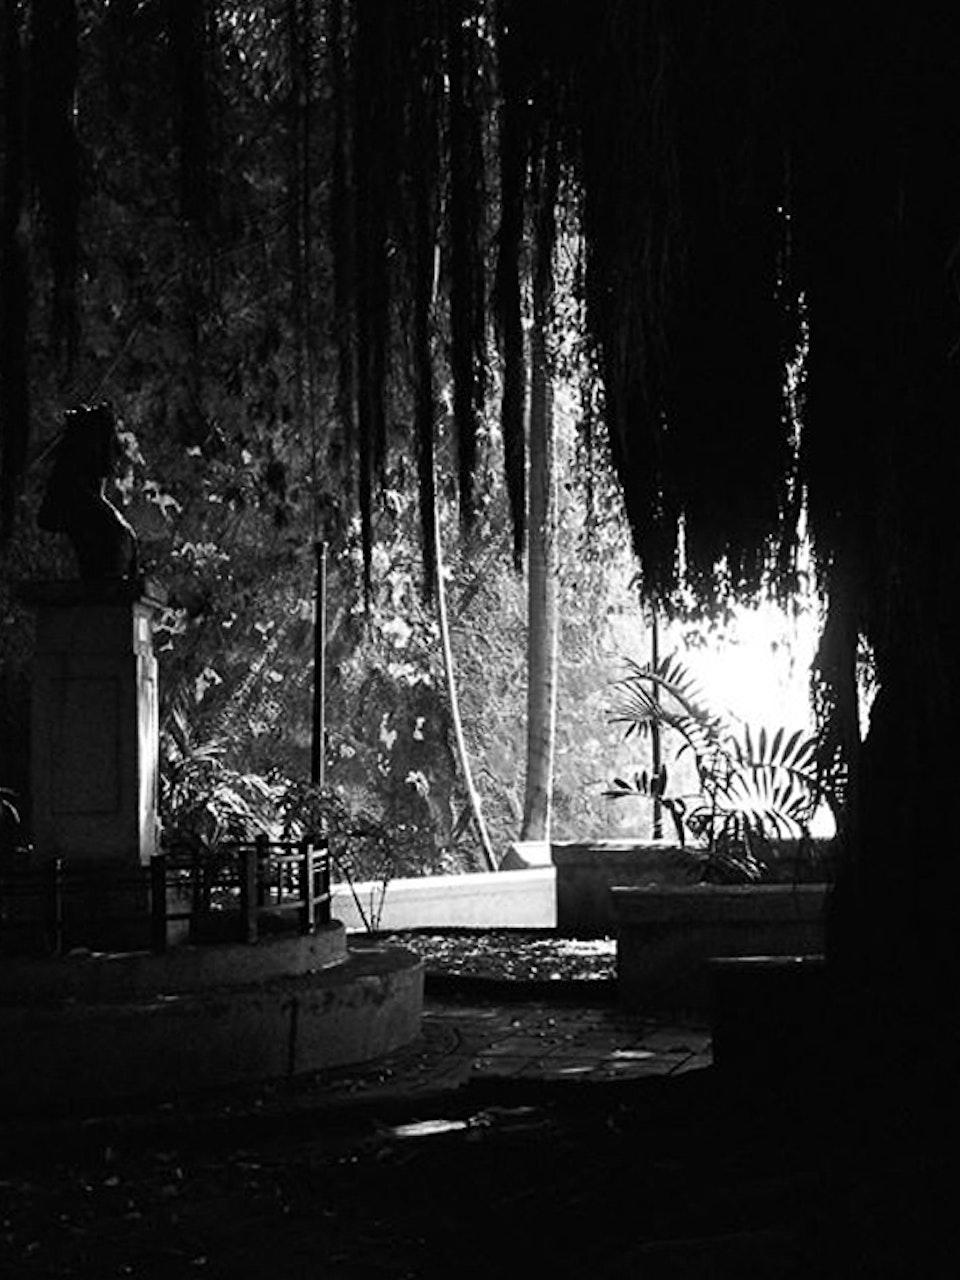 35mm Black and White Film - San Juan, Puerto Rico